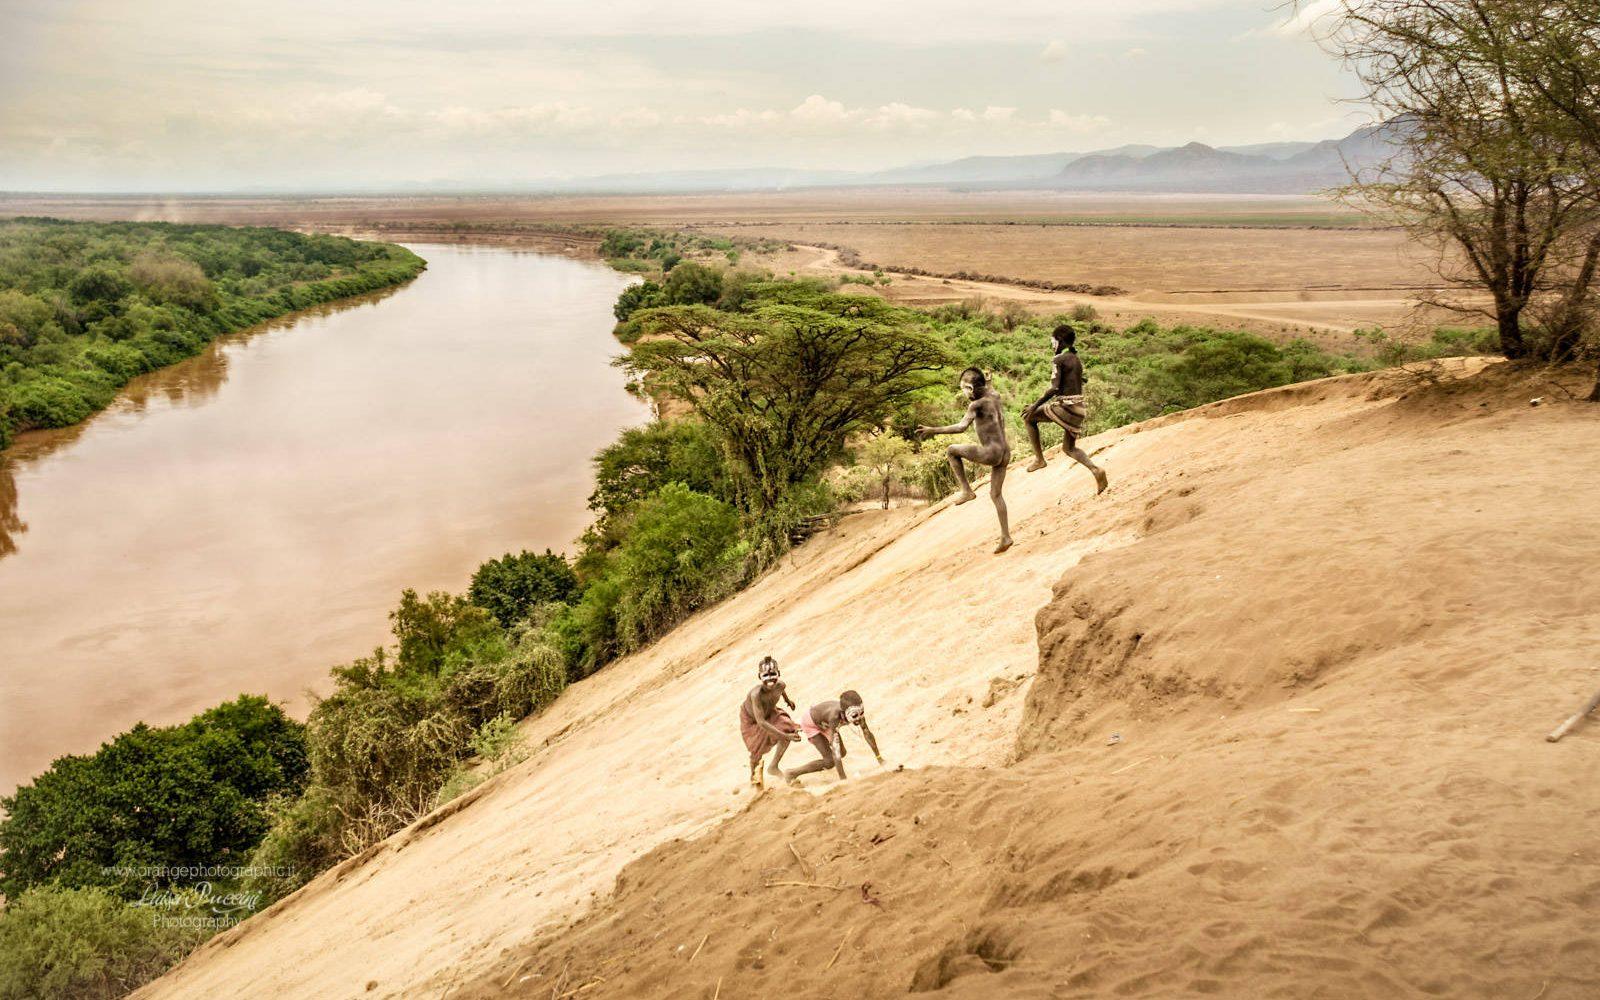 Etiopia: valle dell'Omo